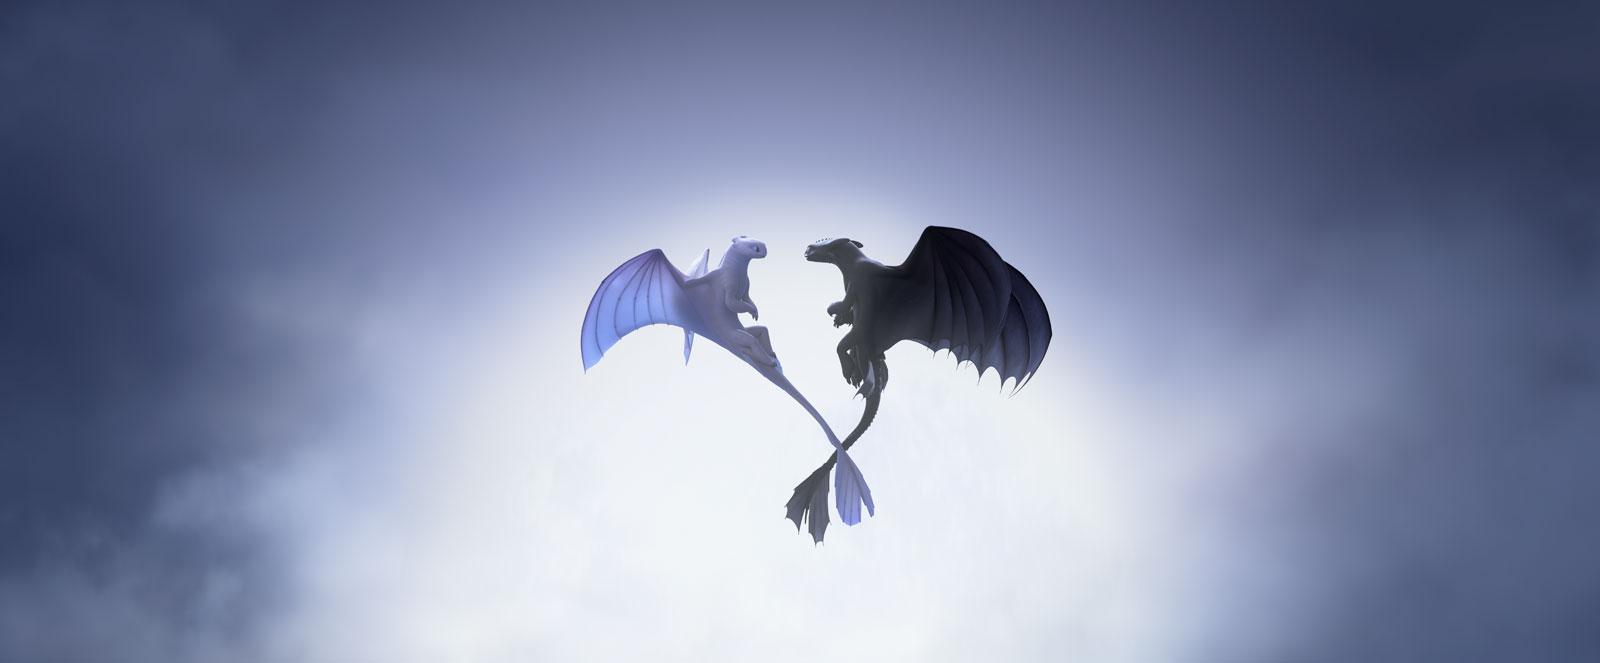 Dragons 3 : Le monde caché DVDRip